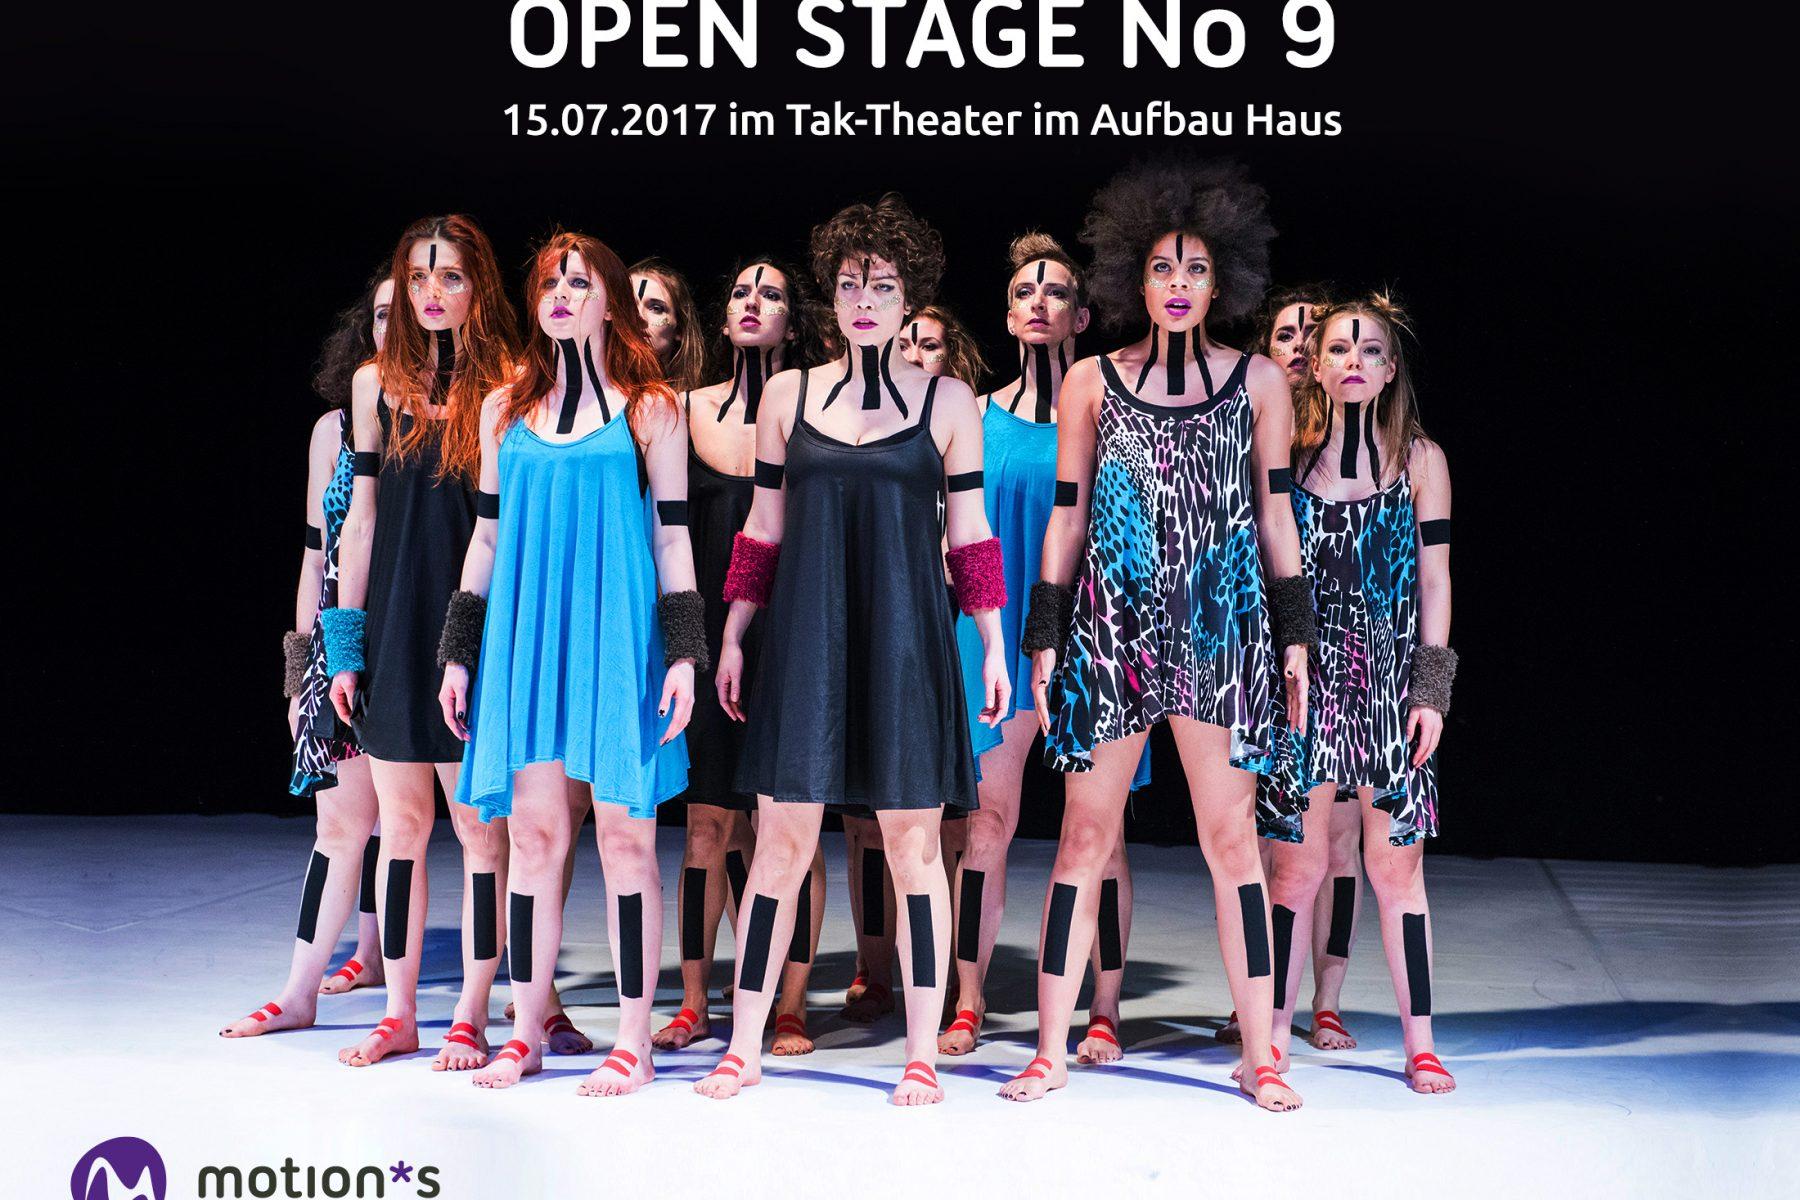 motion*s Tanzstudio open stage 9 Promo